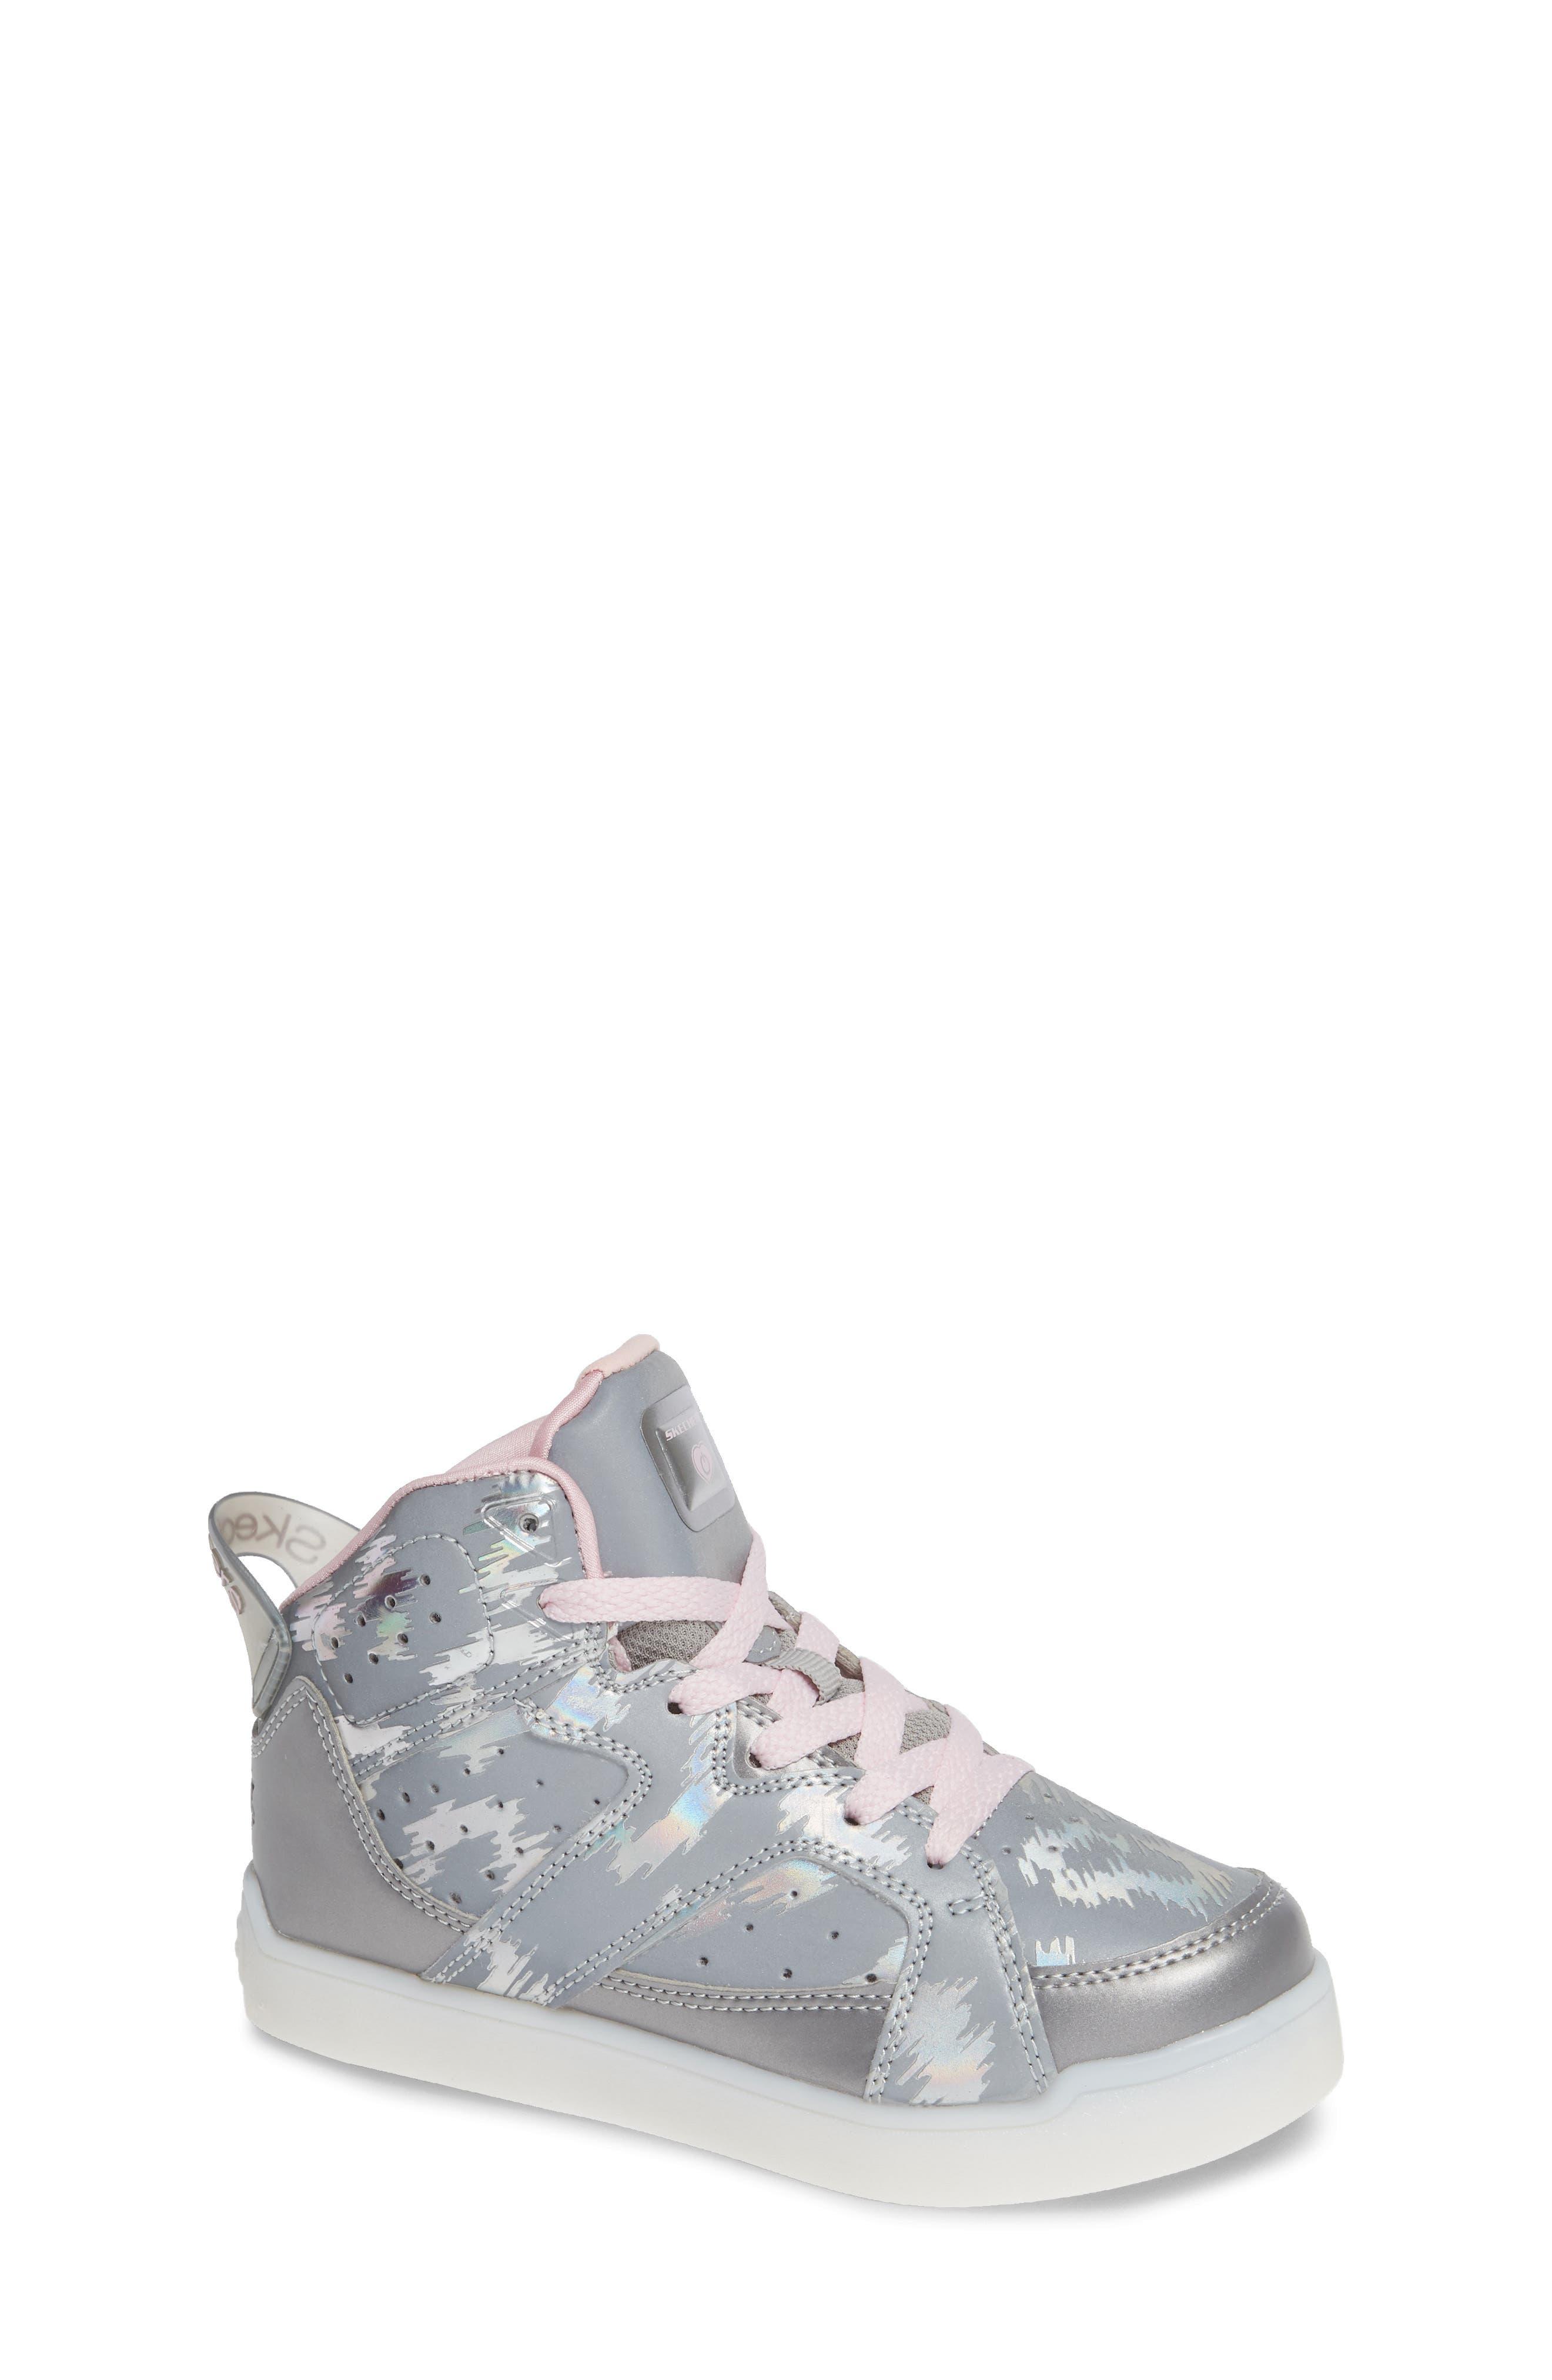 Energy Lights Pro Reflecti-Fab Sneaker,                             Main thumbnail 1, color,                             SILVER